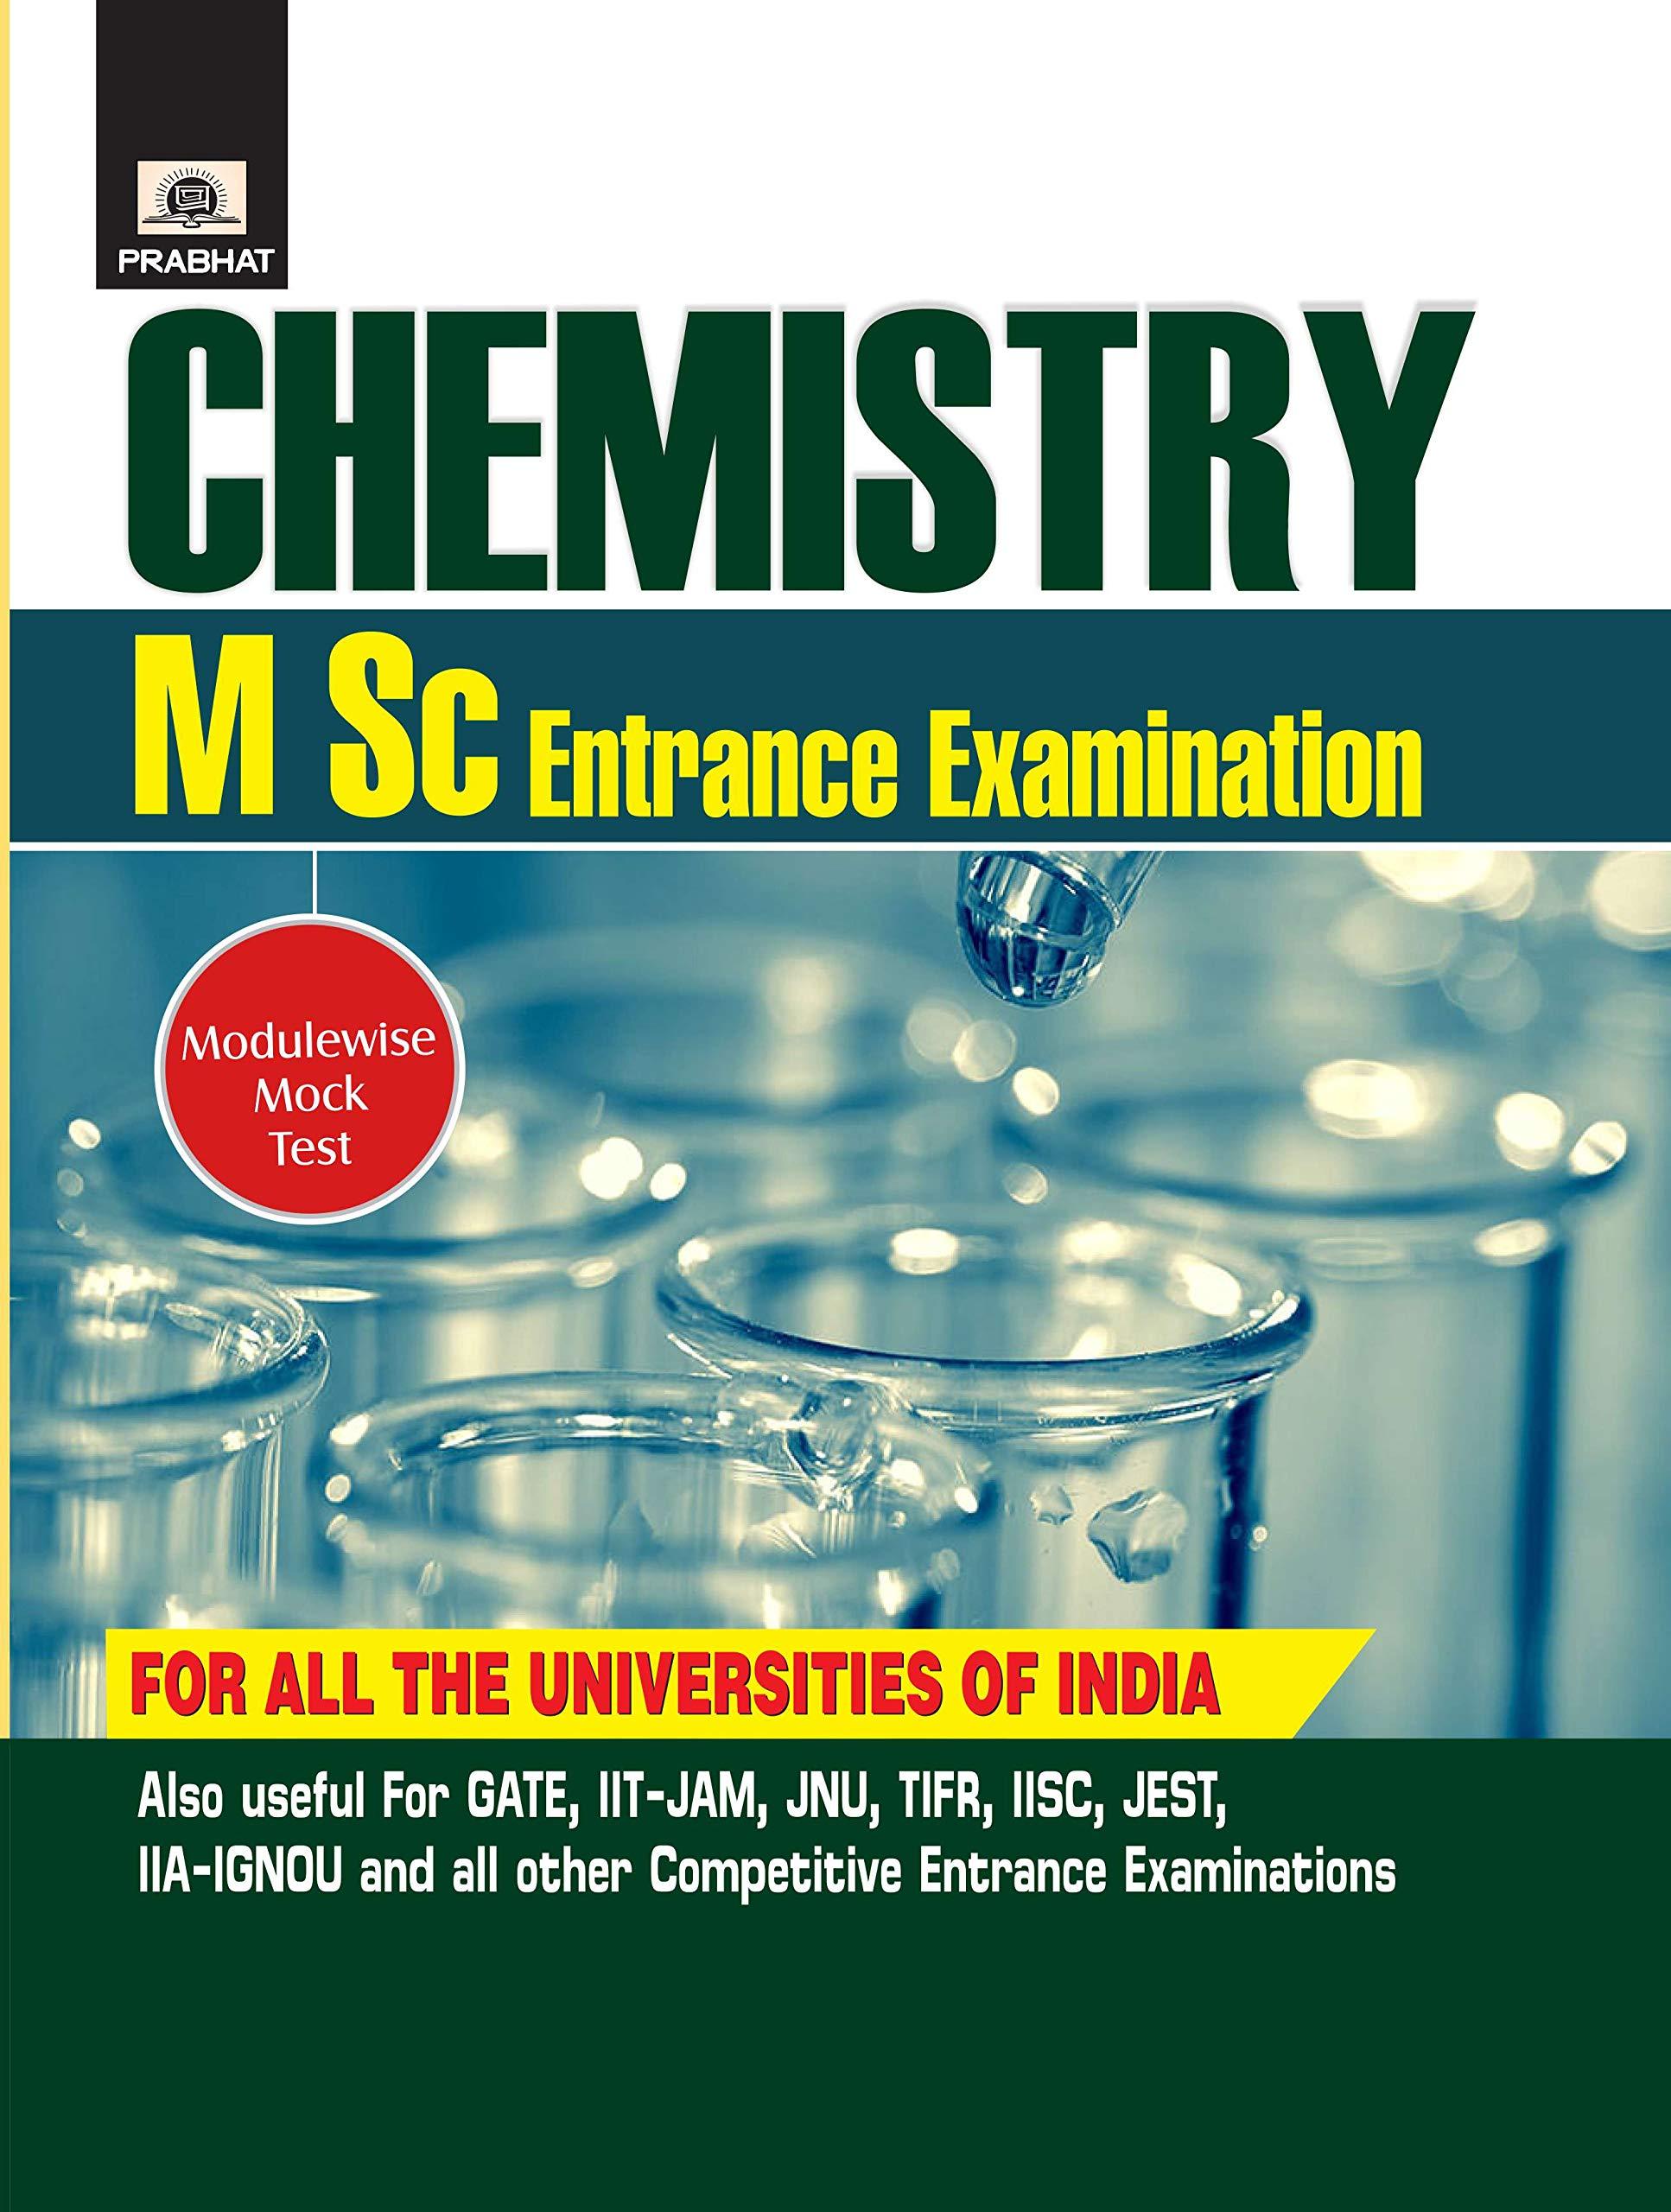 MSC CHEMISTRY ENTRANCE EXAMINATION